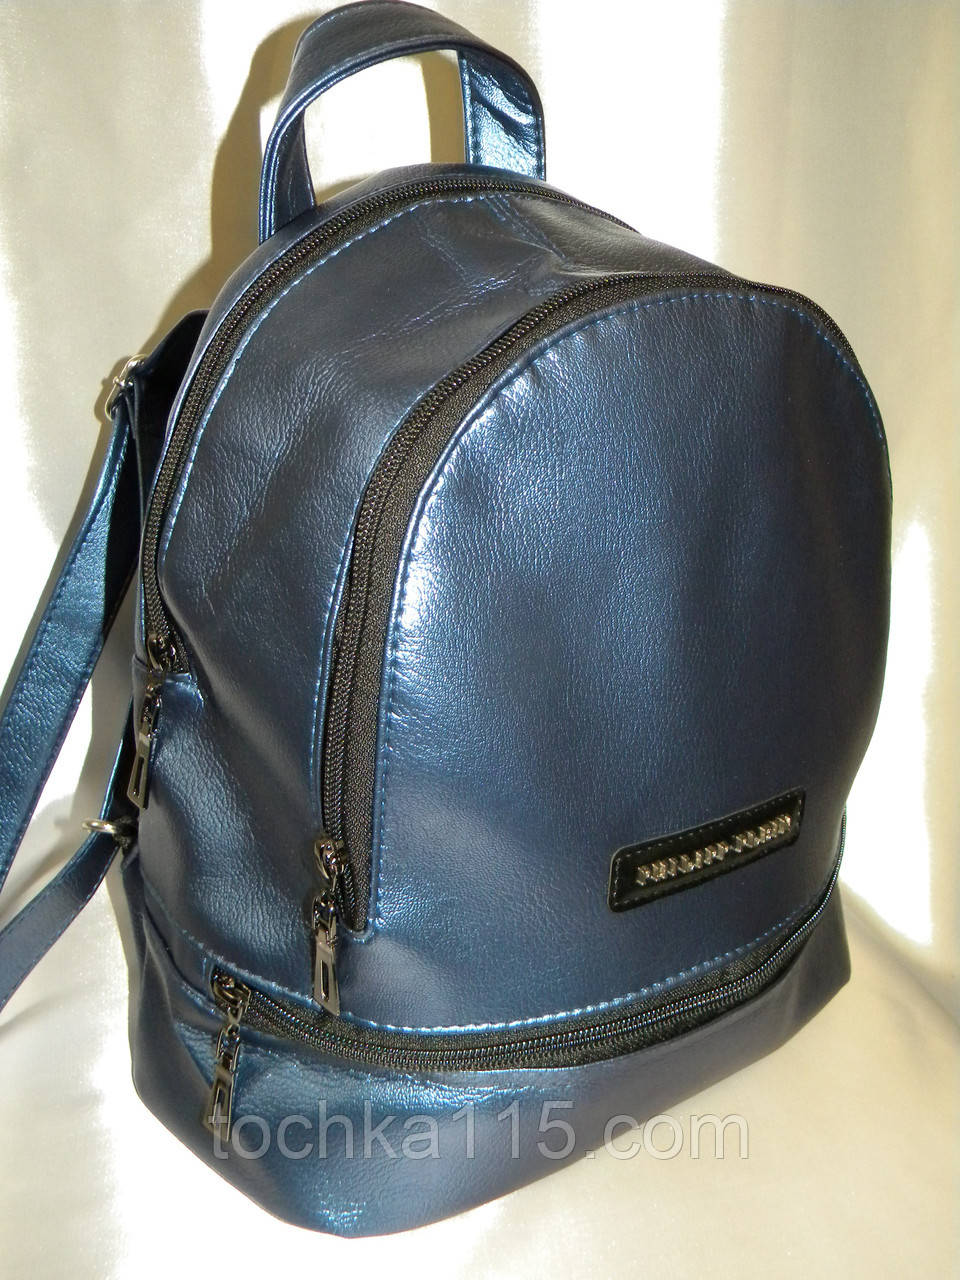 Рюкзак для девочек Philipp Plein синий реплика